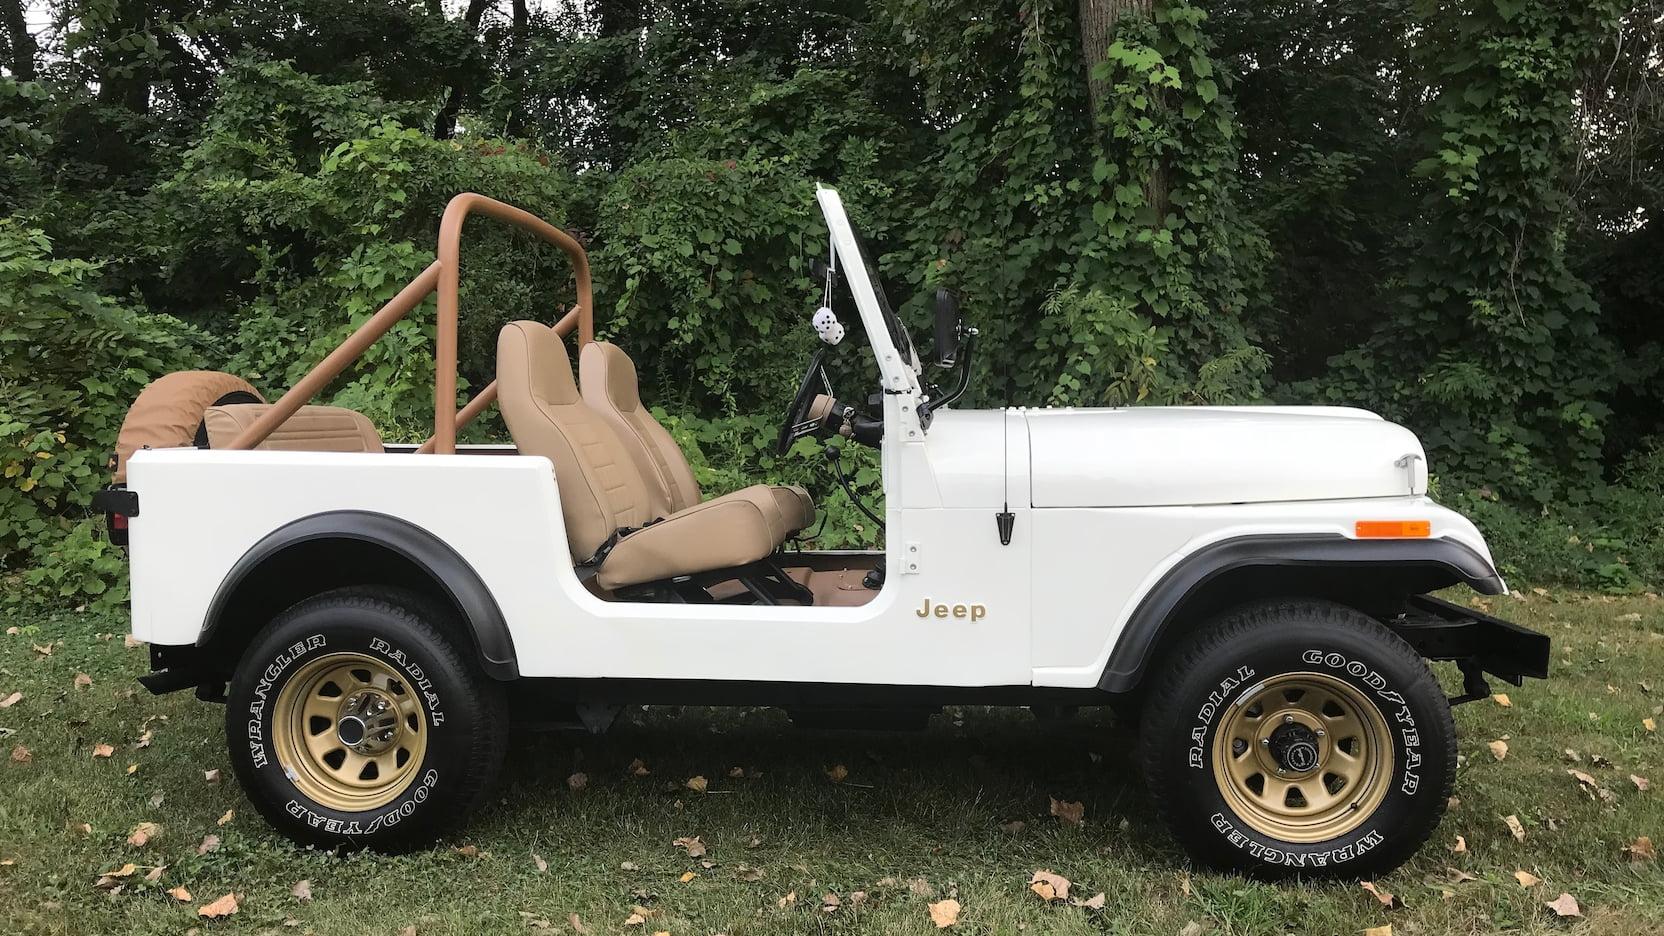 1977 Jeep CJ-7 side profile